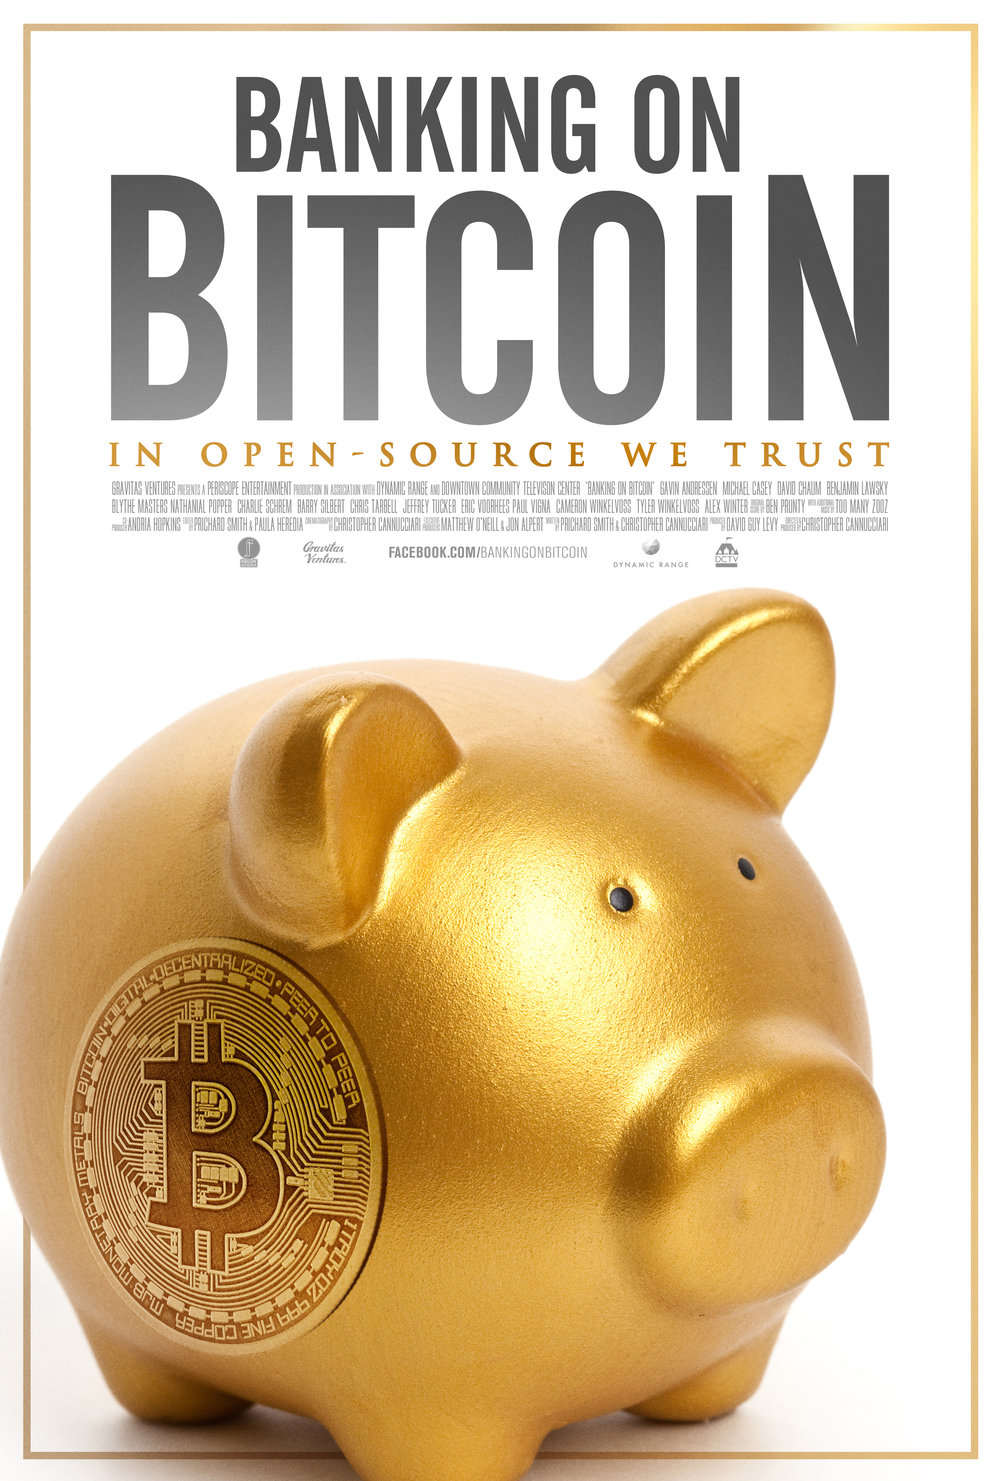 BankingOnBitcoin_KeyArt_15.jpg